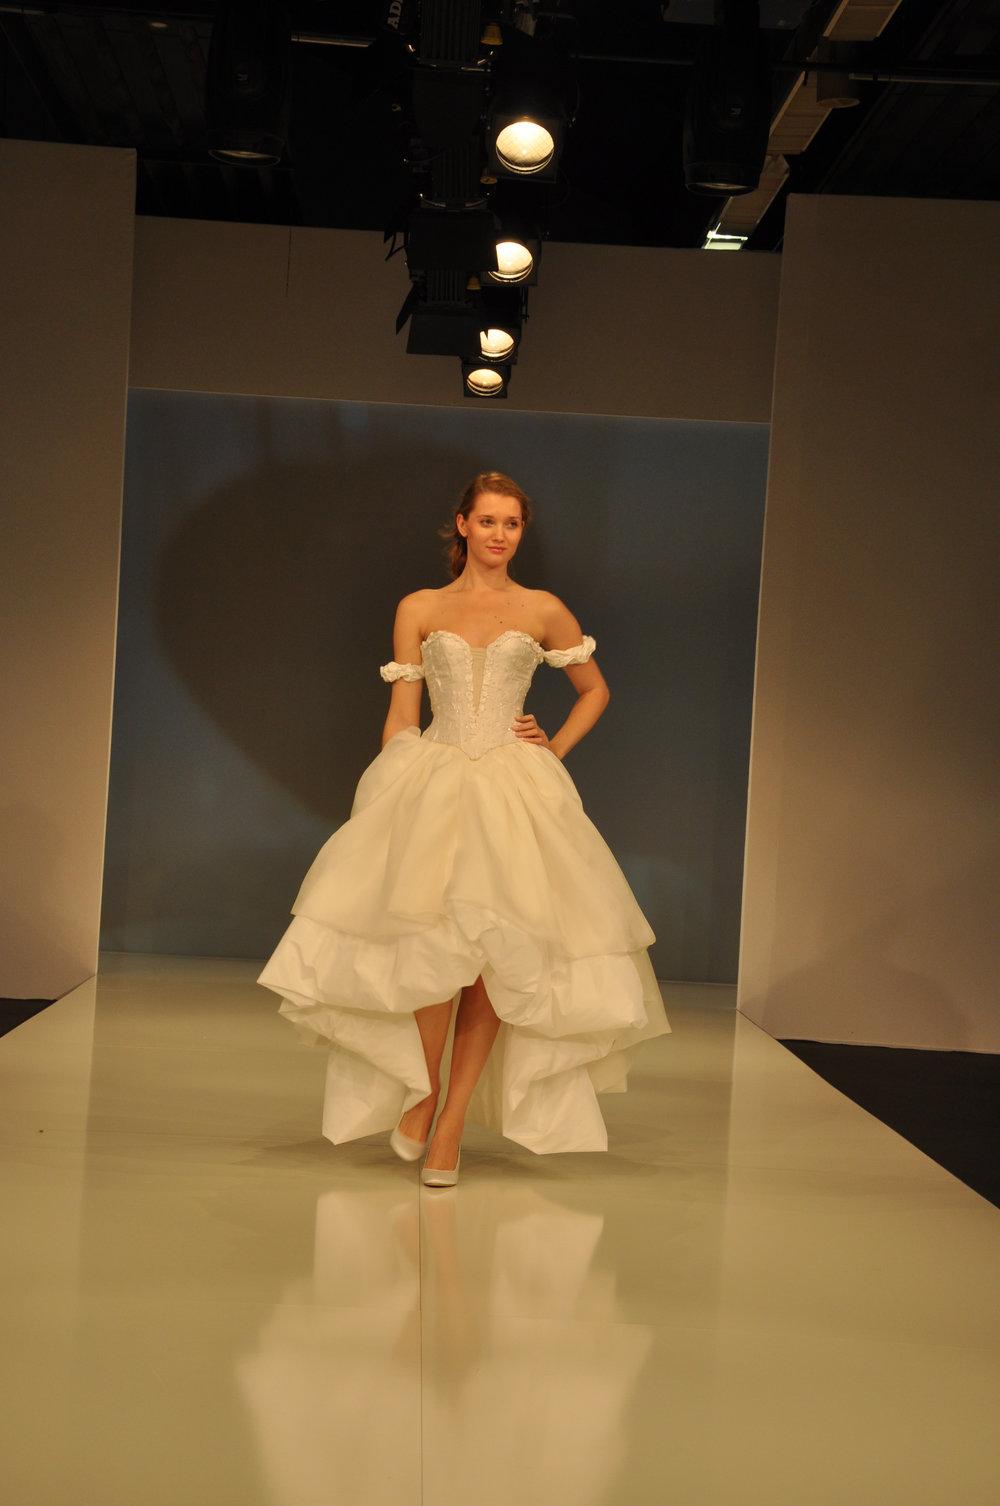 Robe de mariée Ballerine courte longue Agnes Szabelewski.jpg